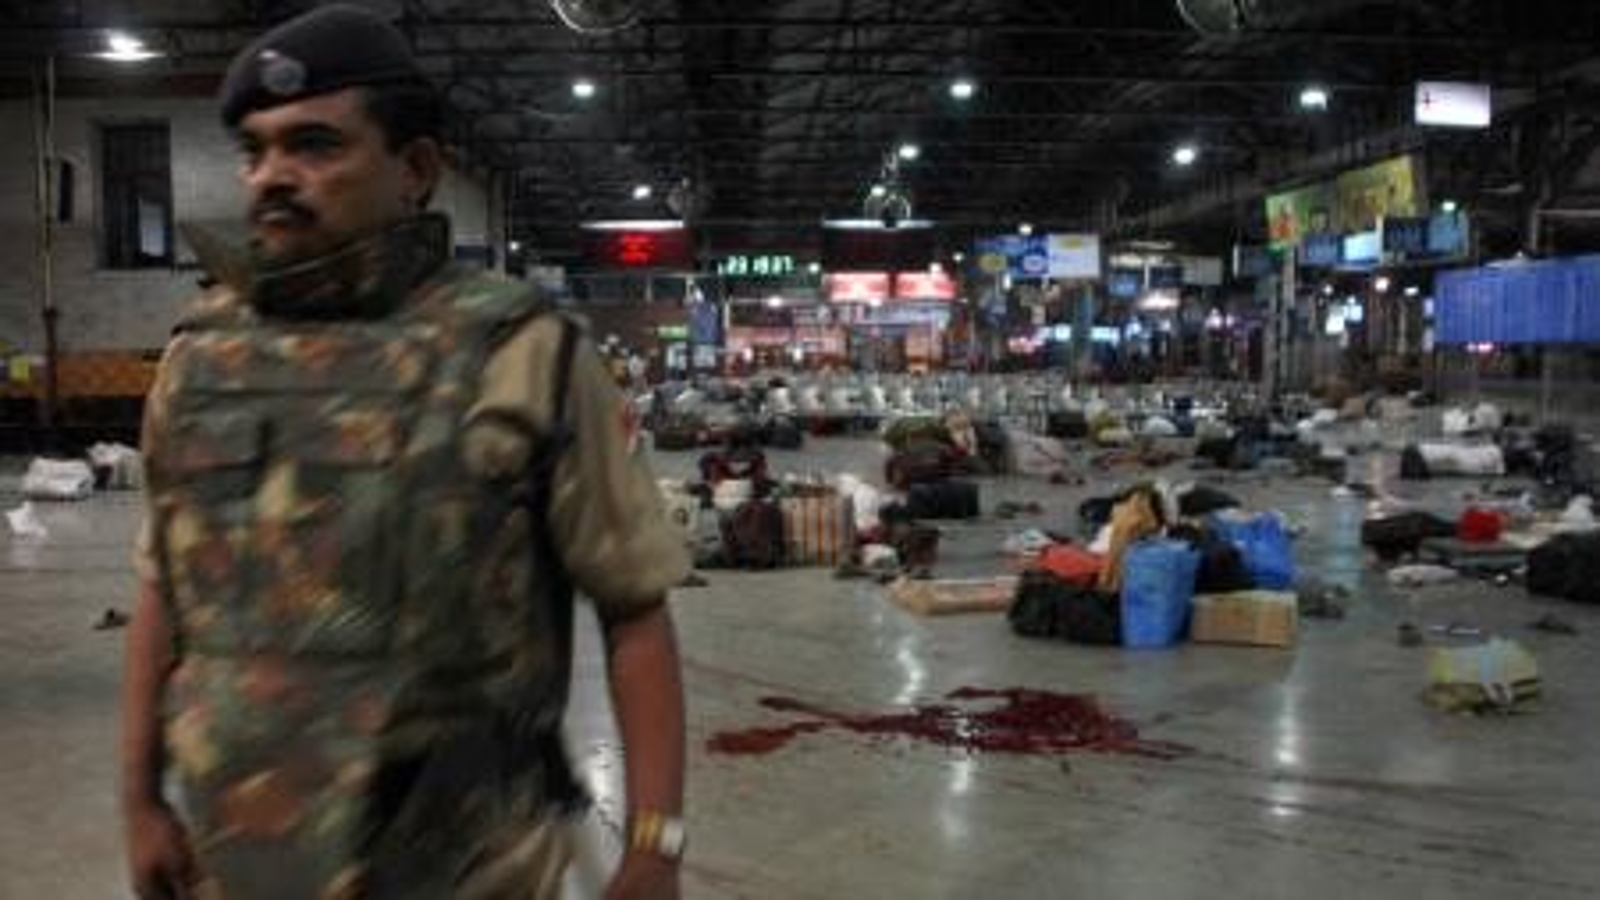 Mumbai-Terrorist attack-26/11